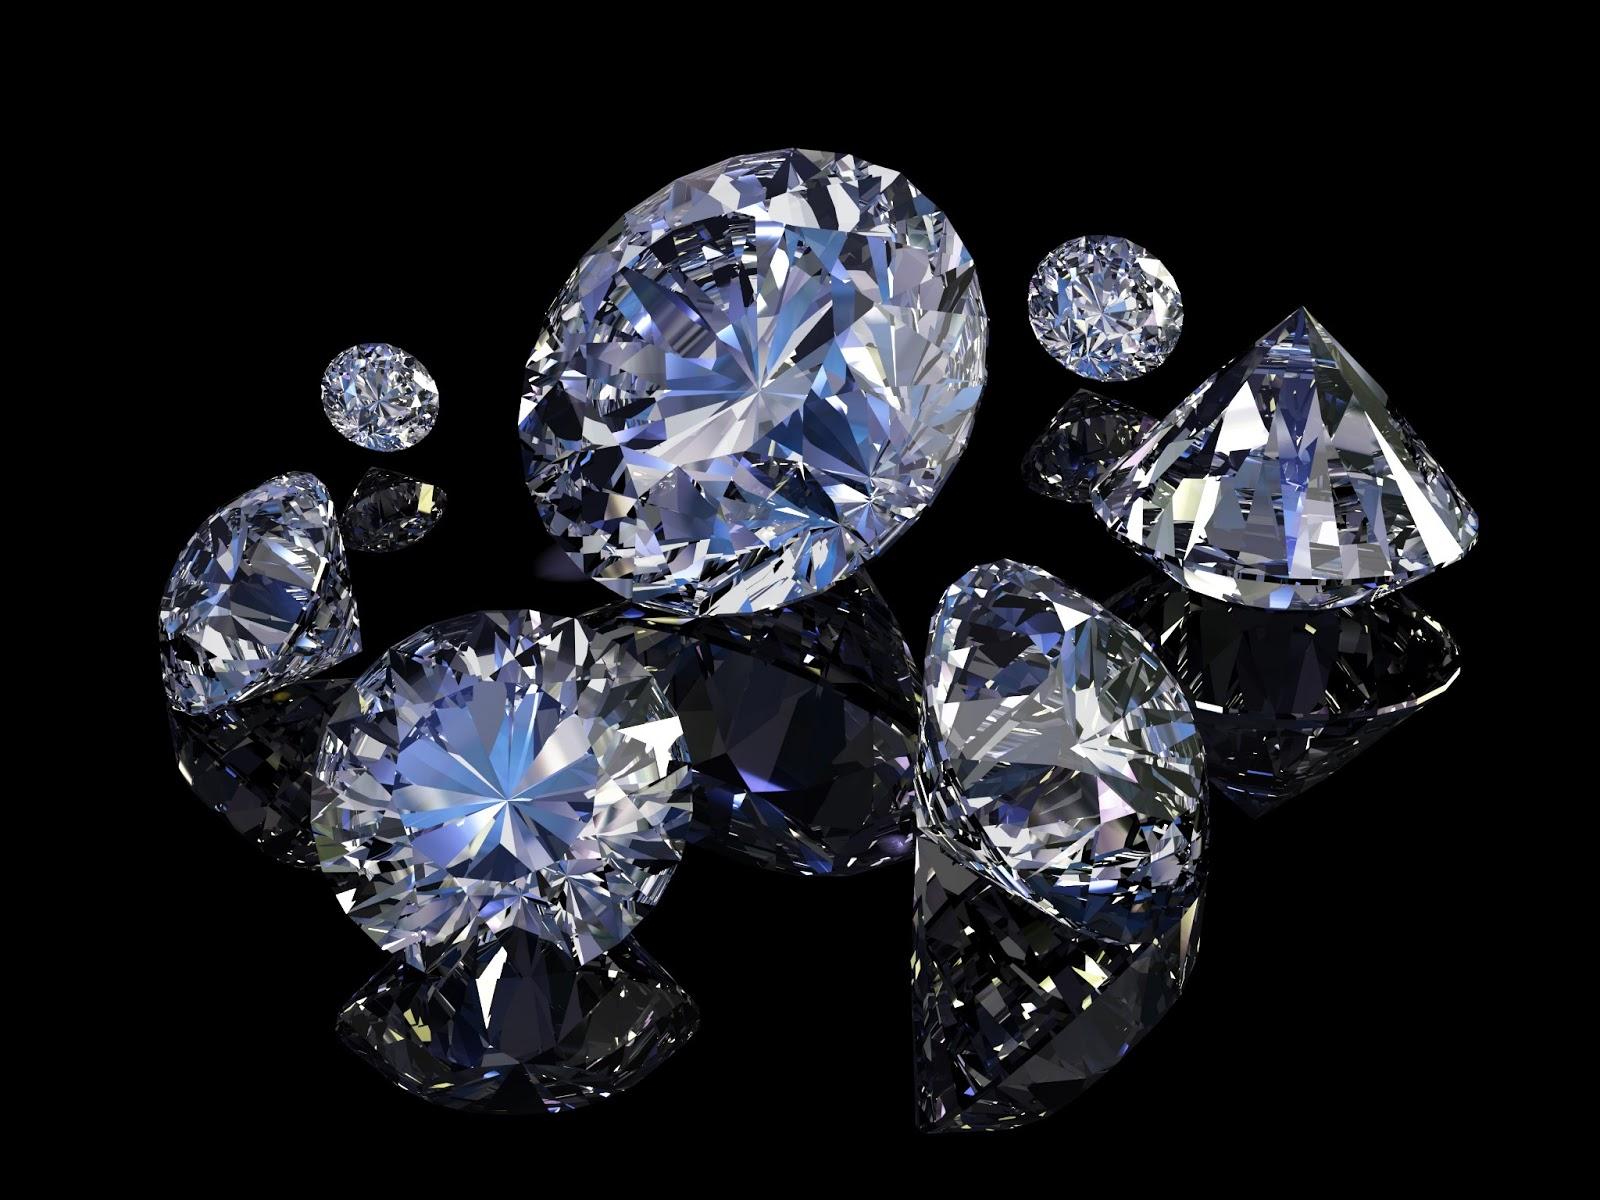 The Symbolism Behind The Memorial Diamonds